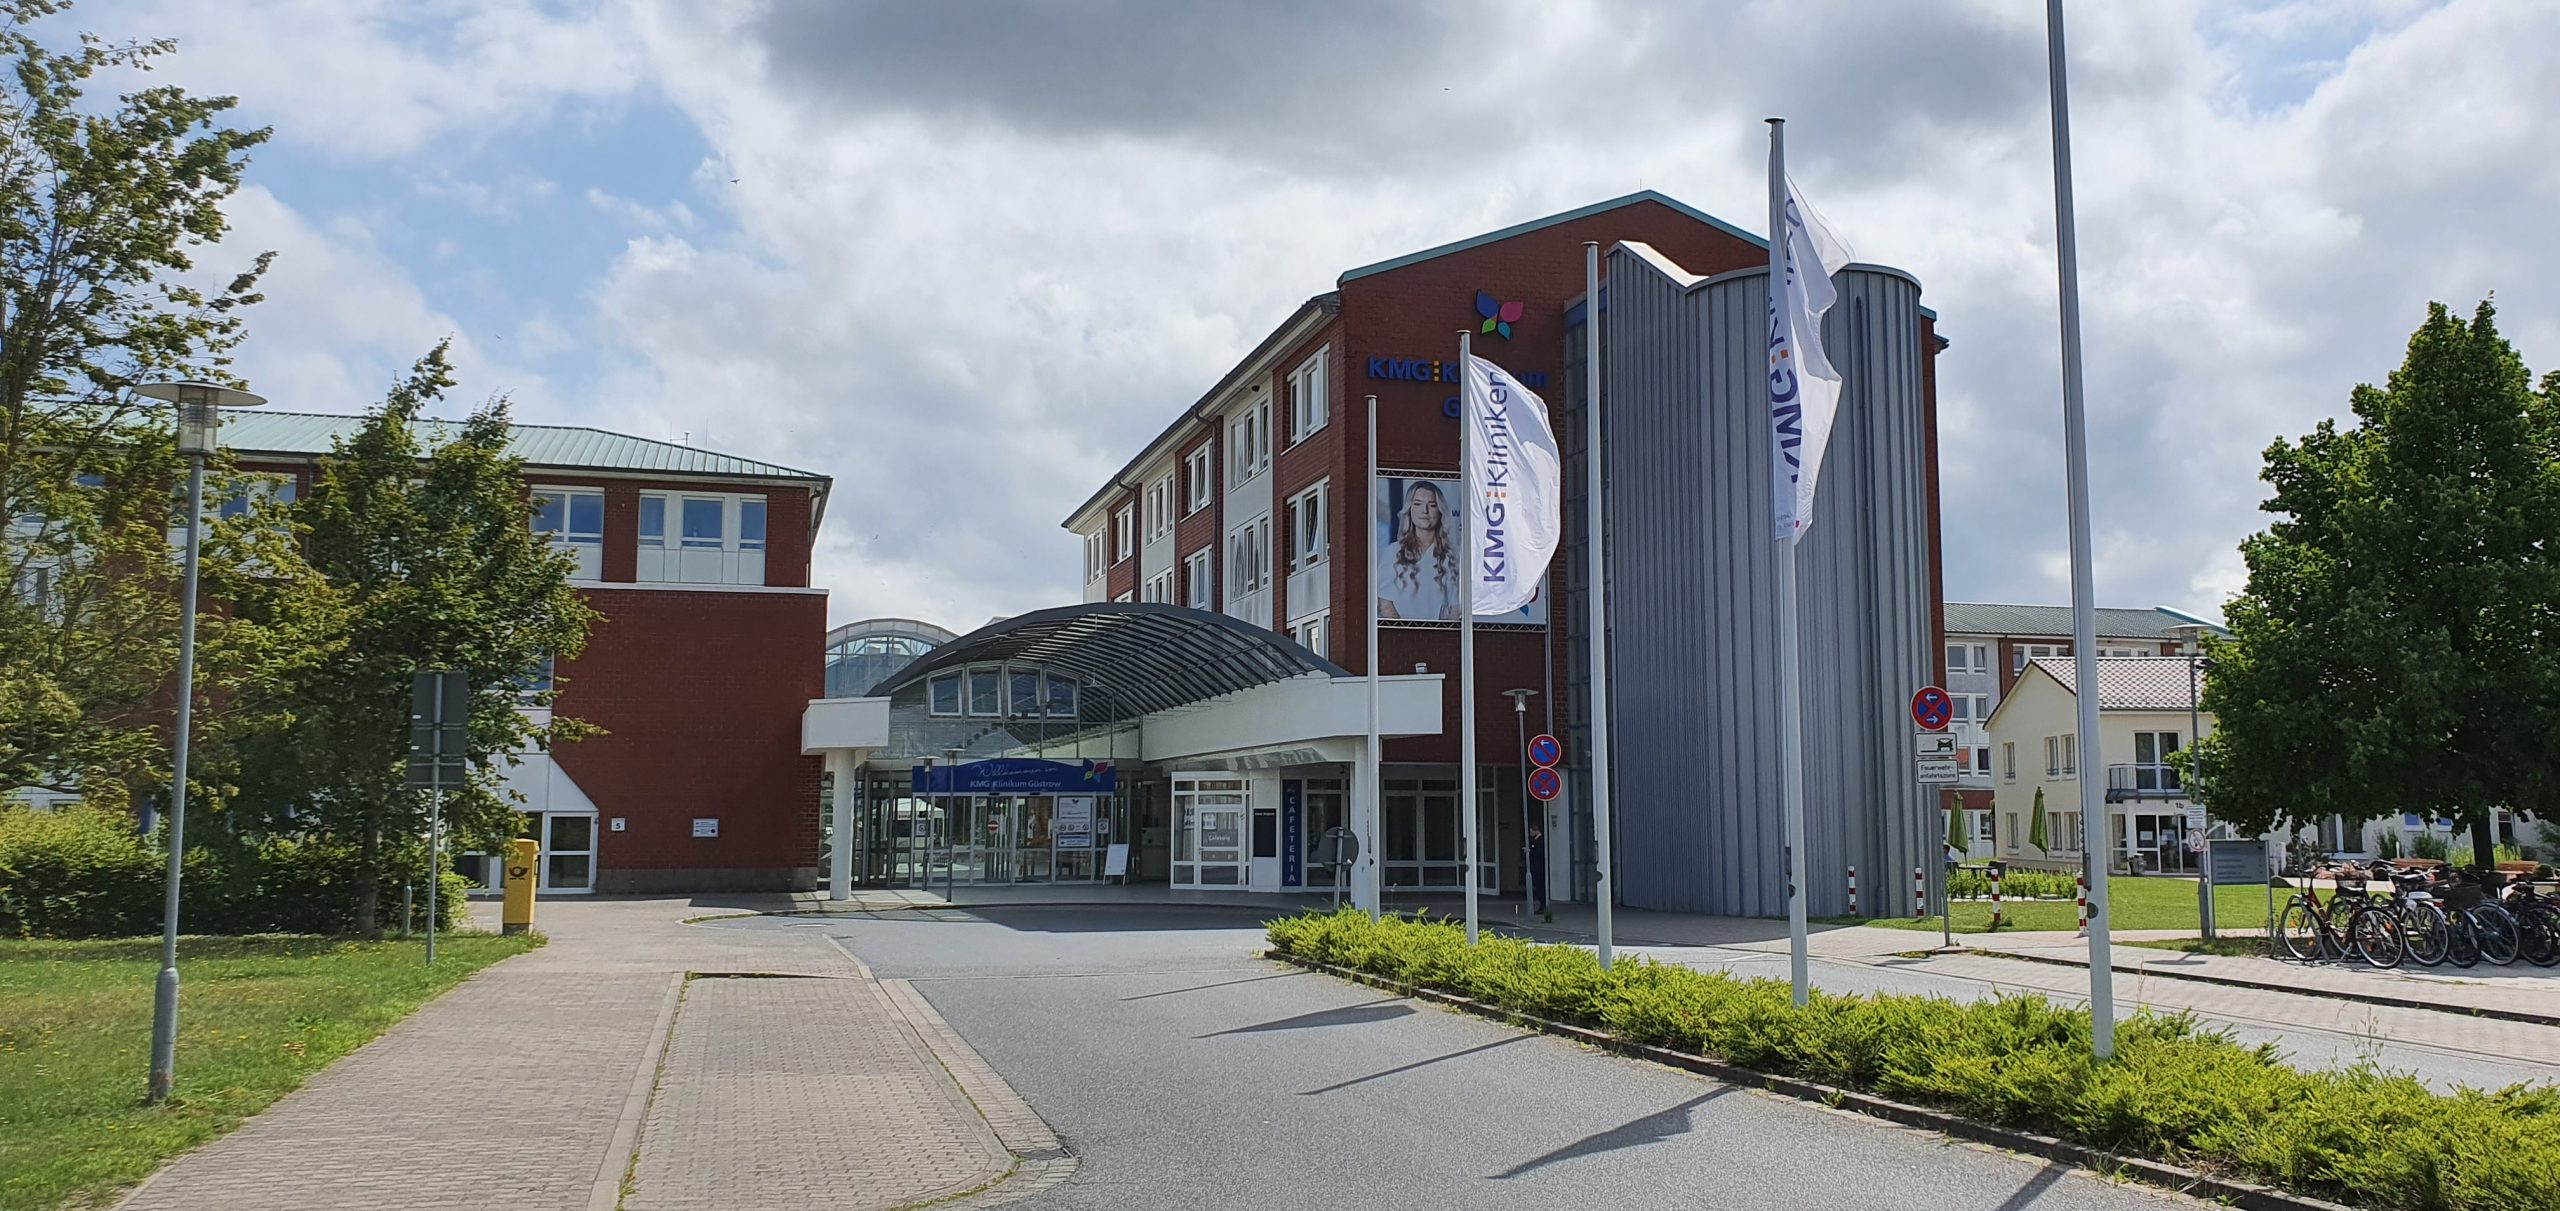 KMG Klinikum Güstrow